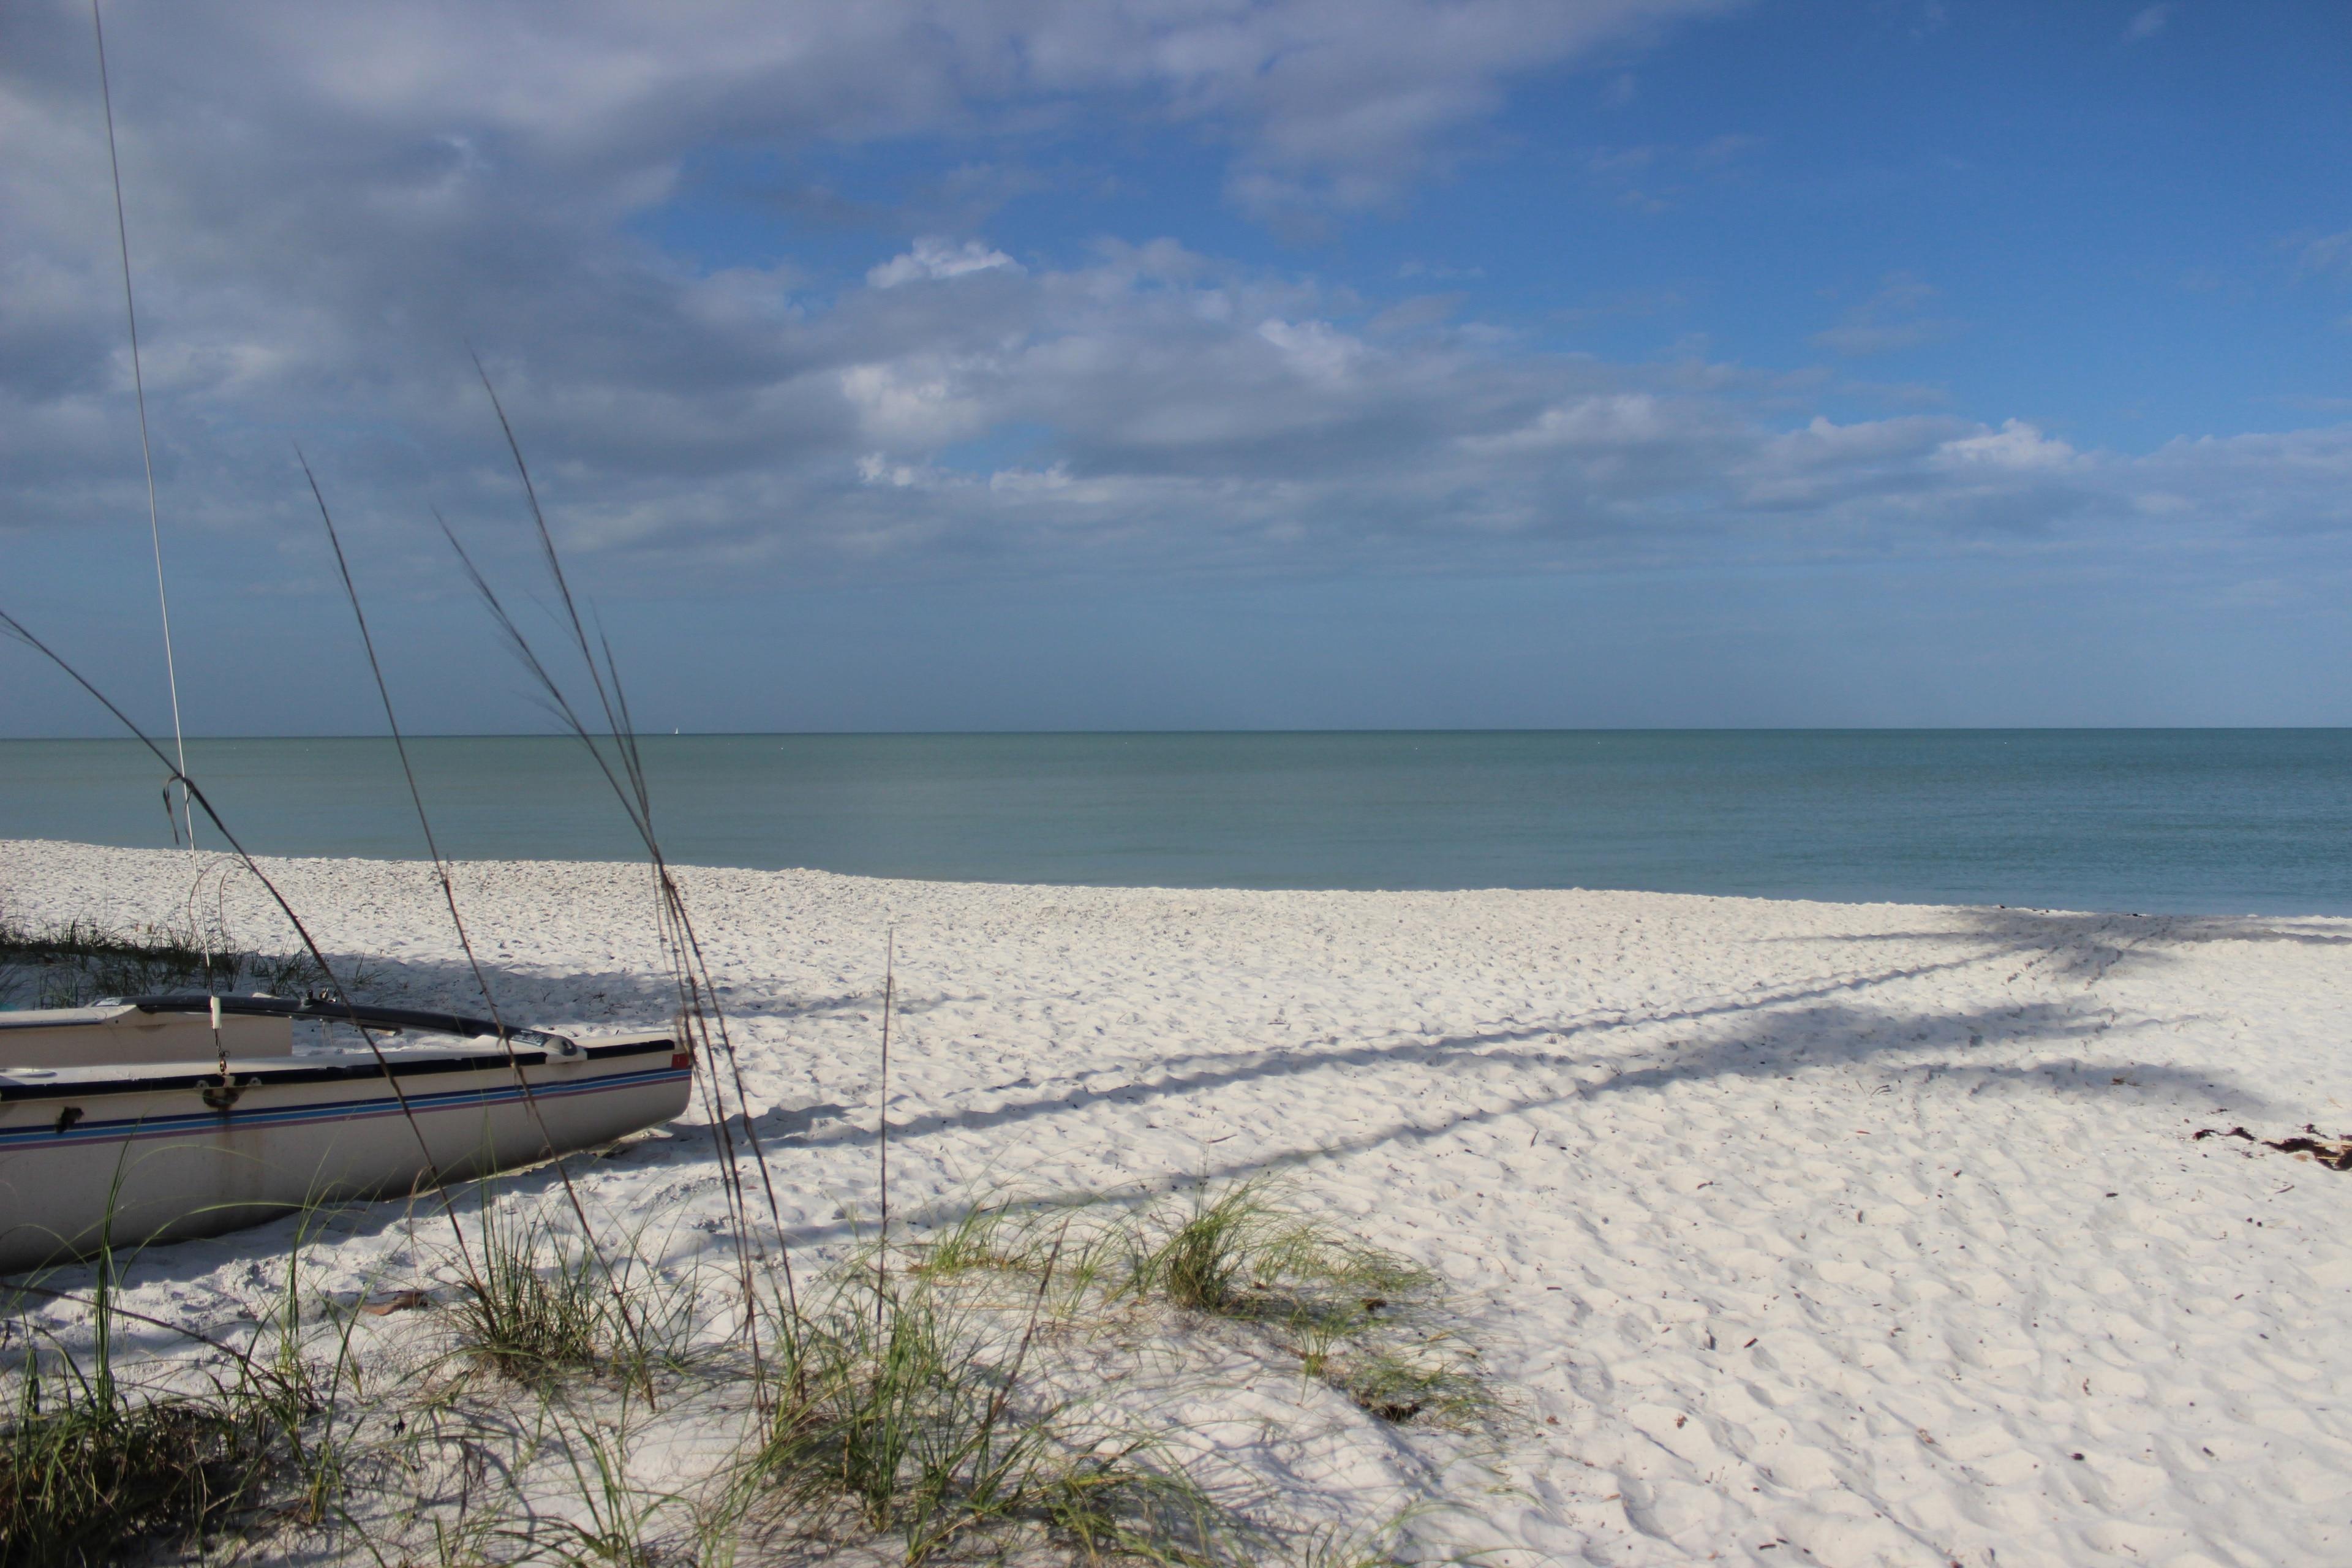 Vanderbilt Beach, North Naples, Florida, United States of America